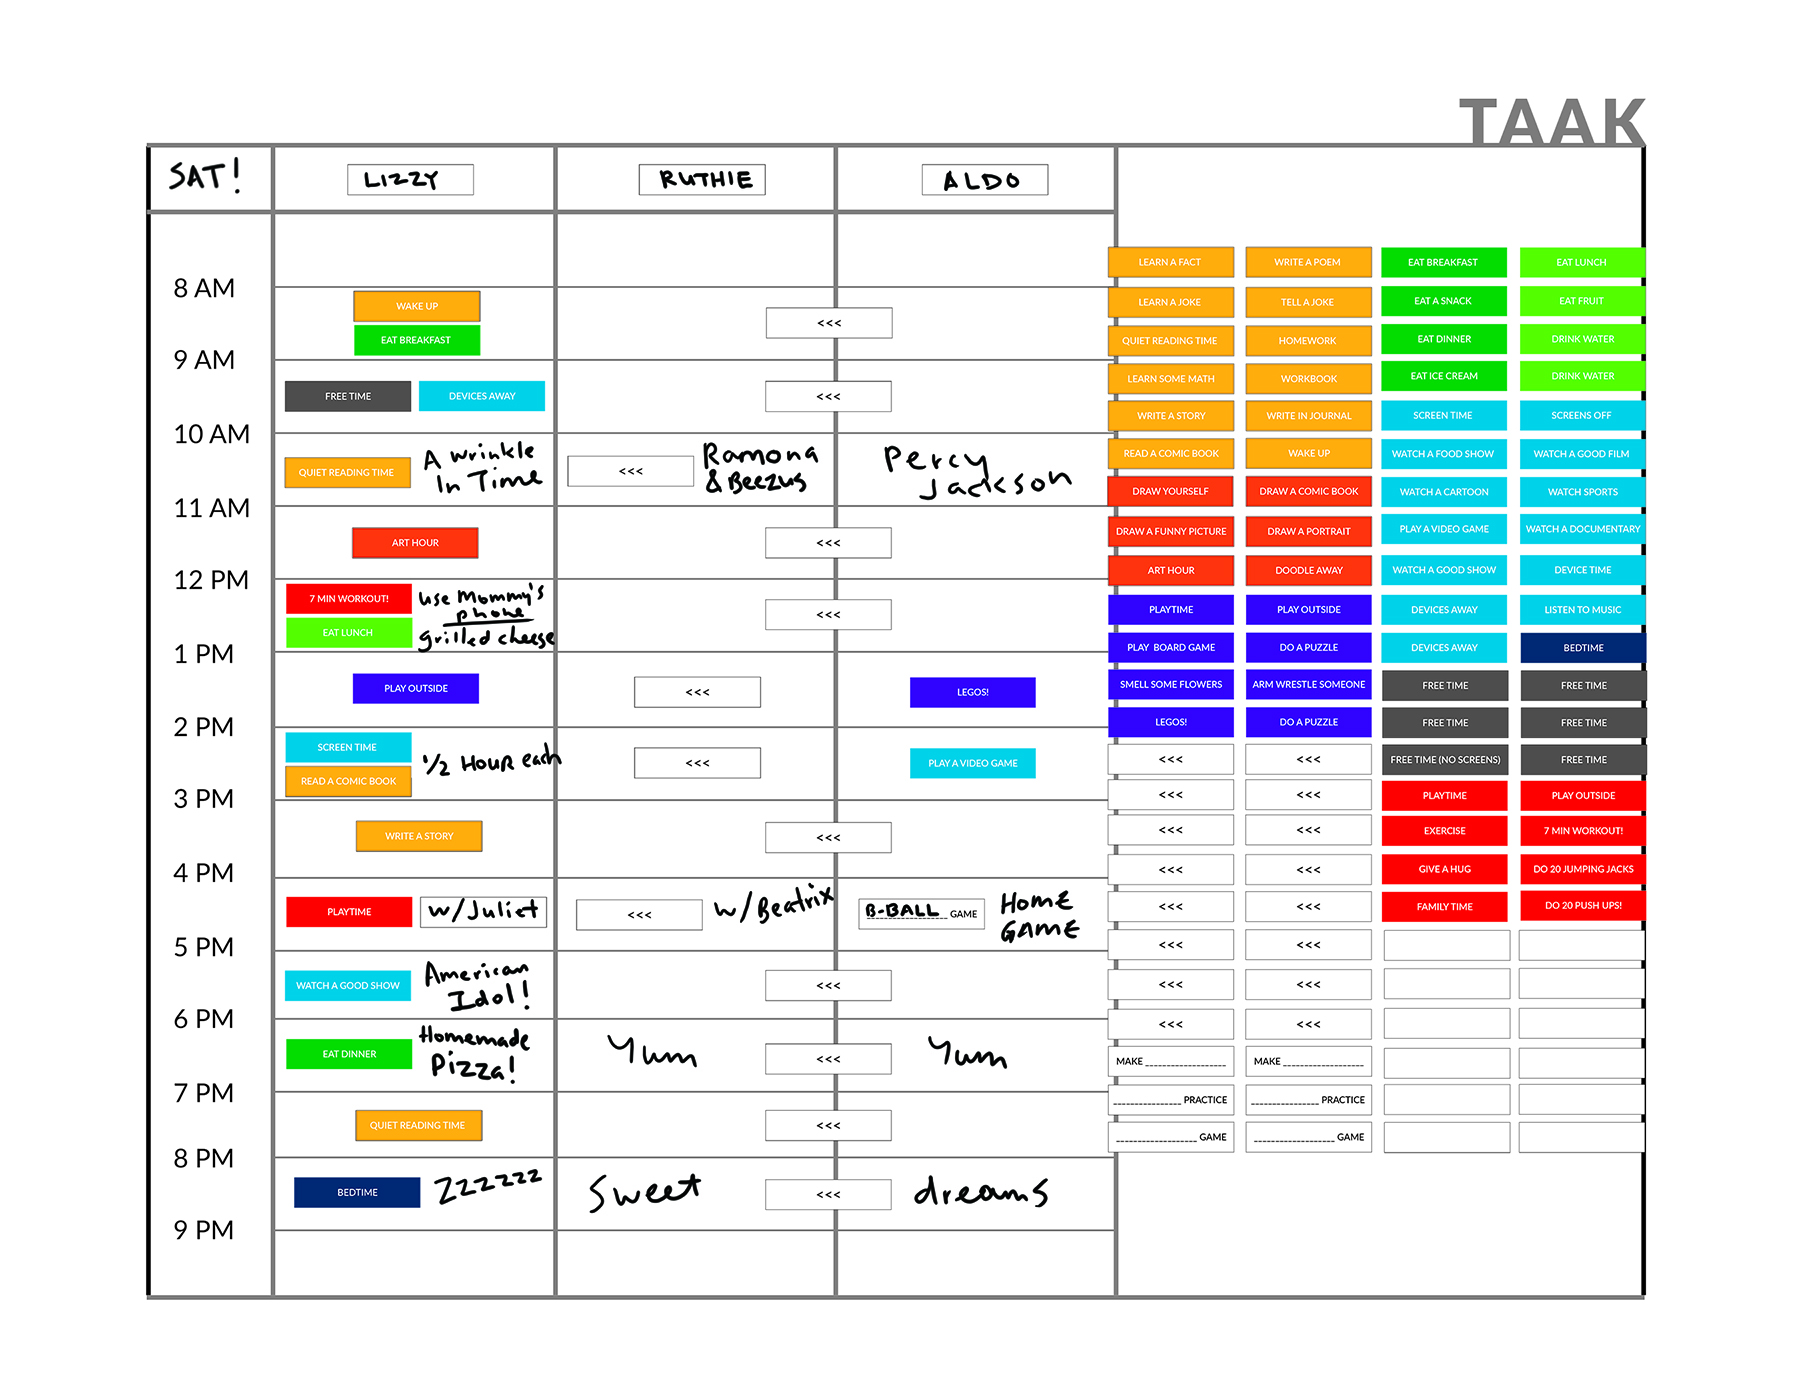 TAAAK_test_filled.jpg